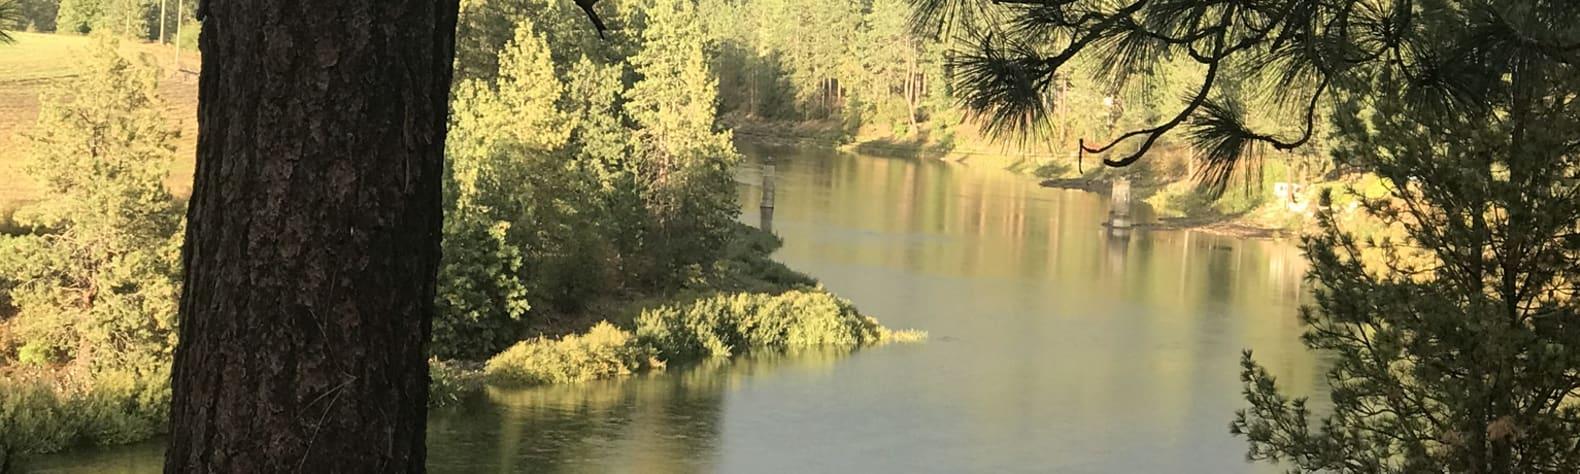 River Haven Coeur D'Alene PF